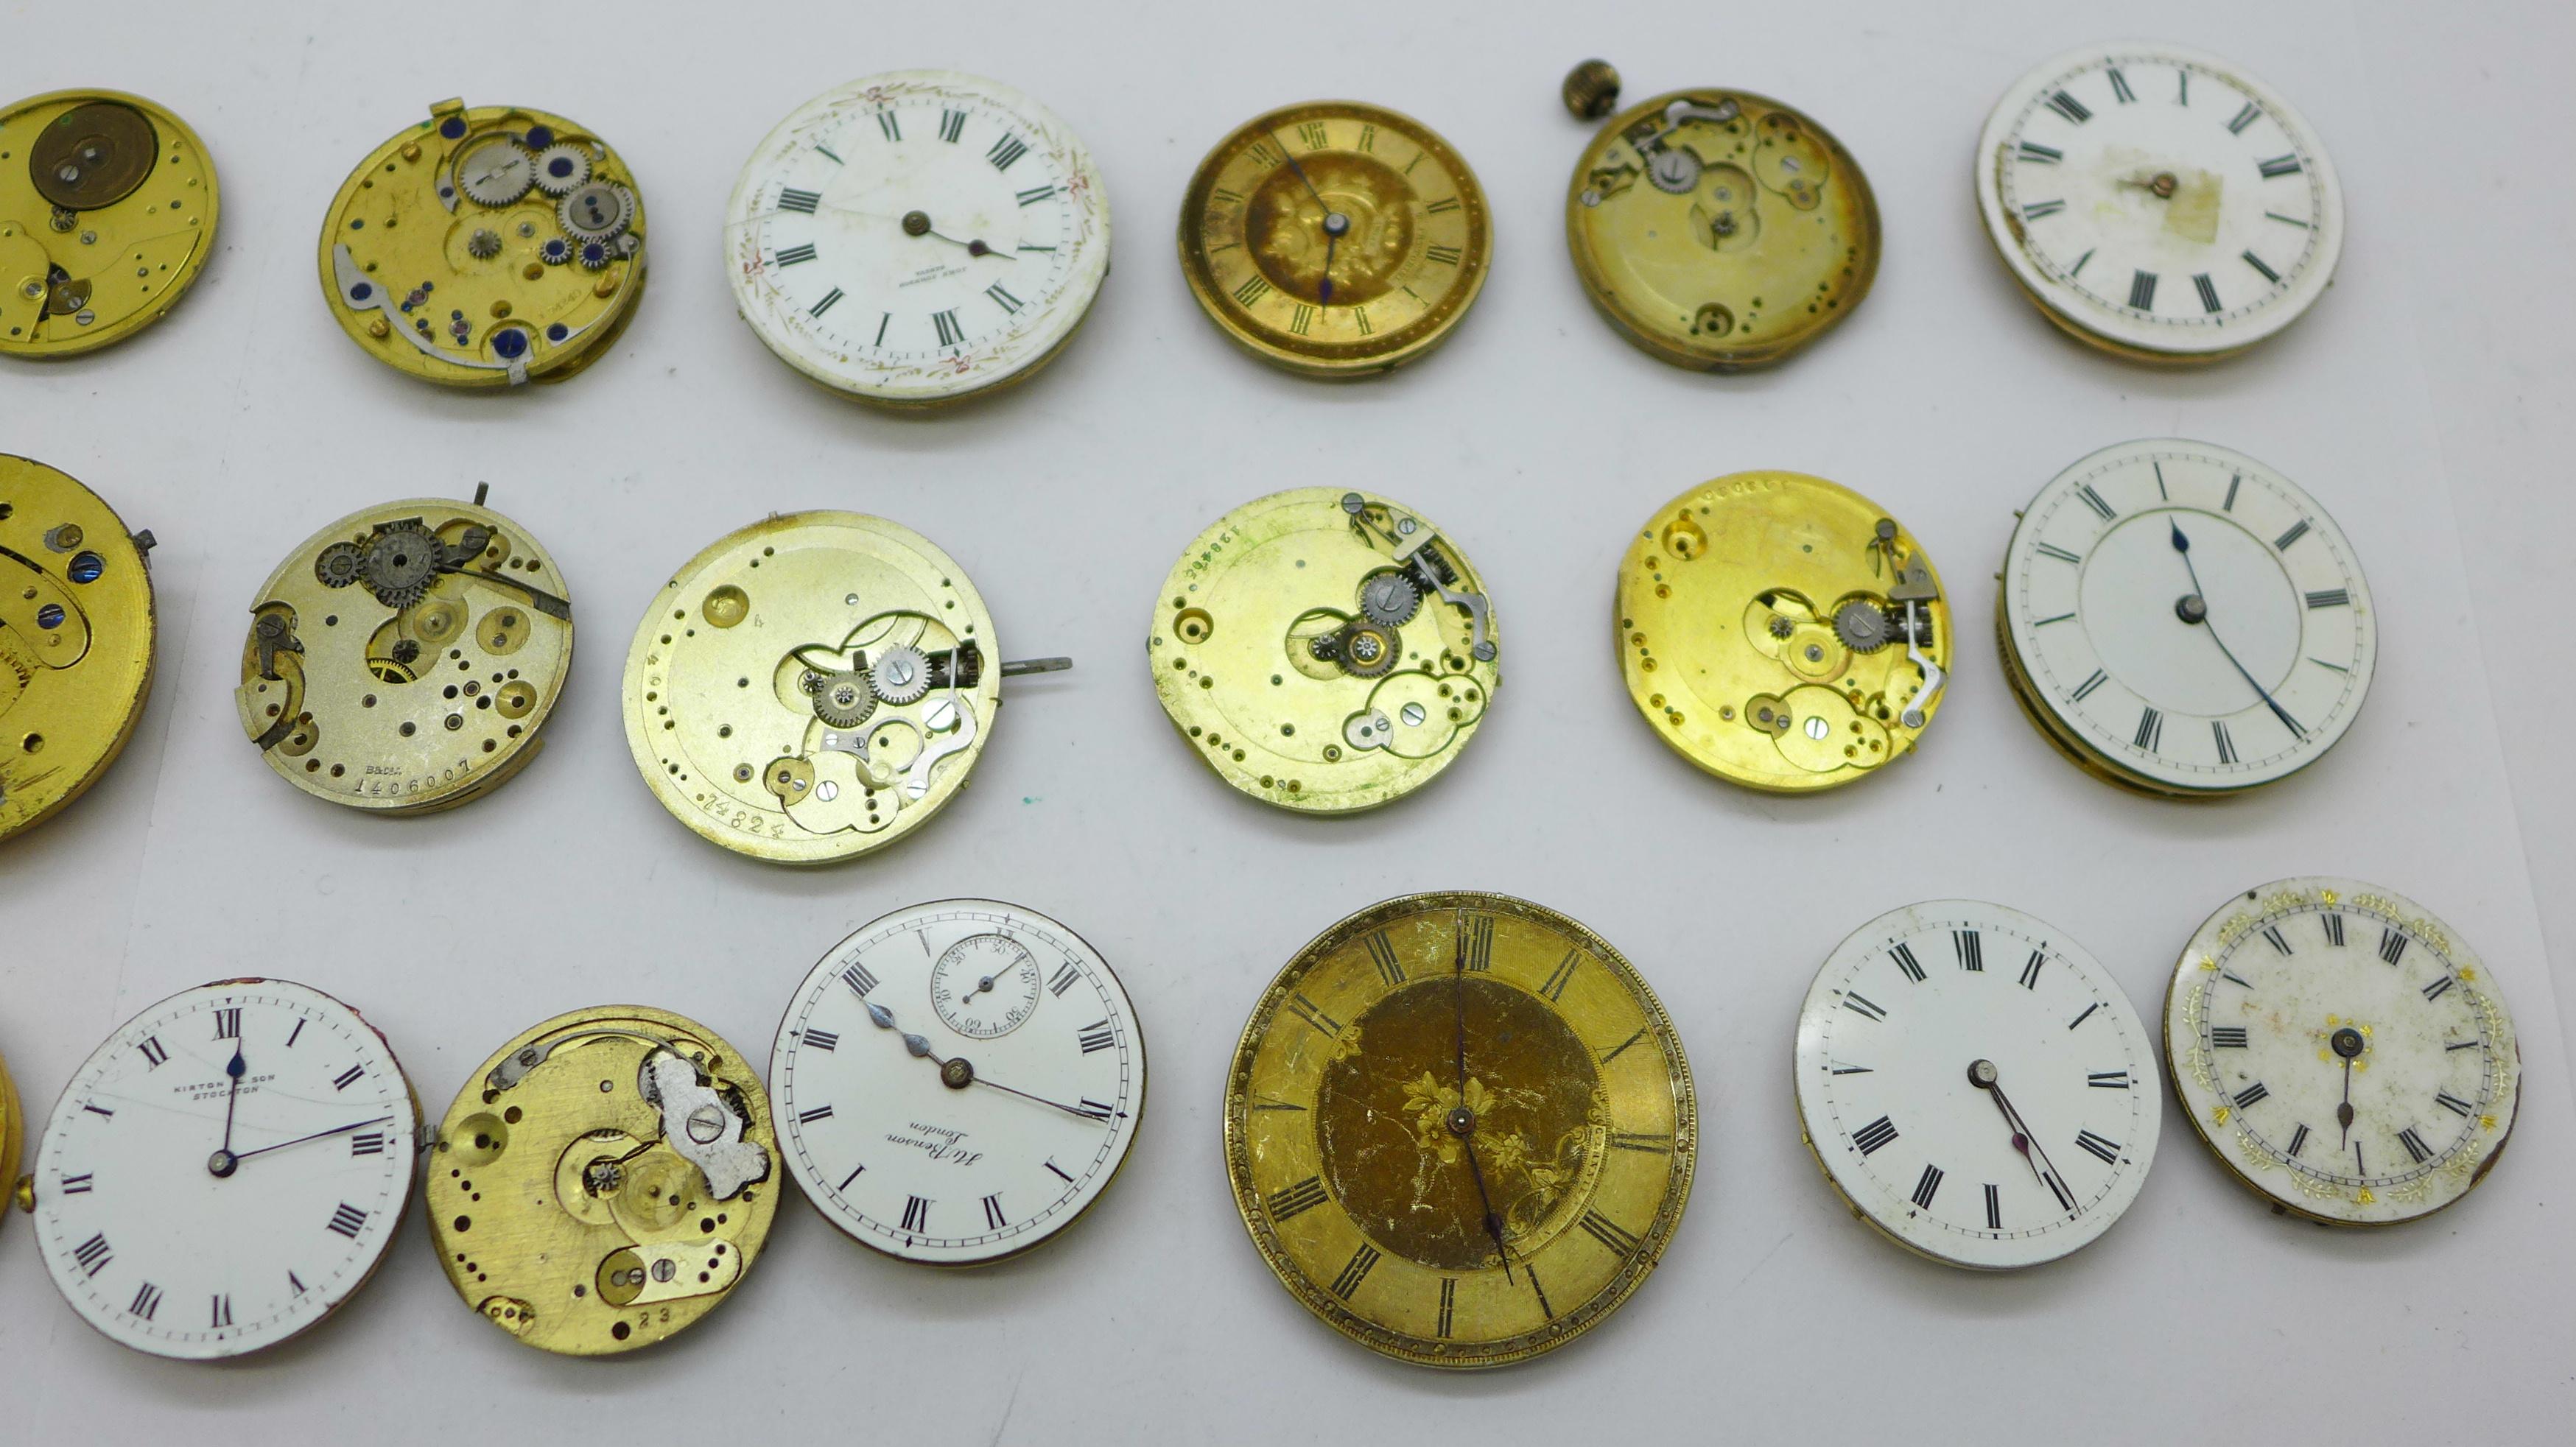 Twenty-five wristwatch, fob and pocket watch movements, Elgin, JW Benson, Waltham, etc. - Image 3 of 4